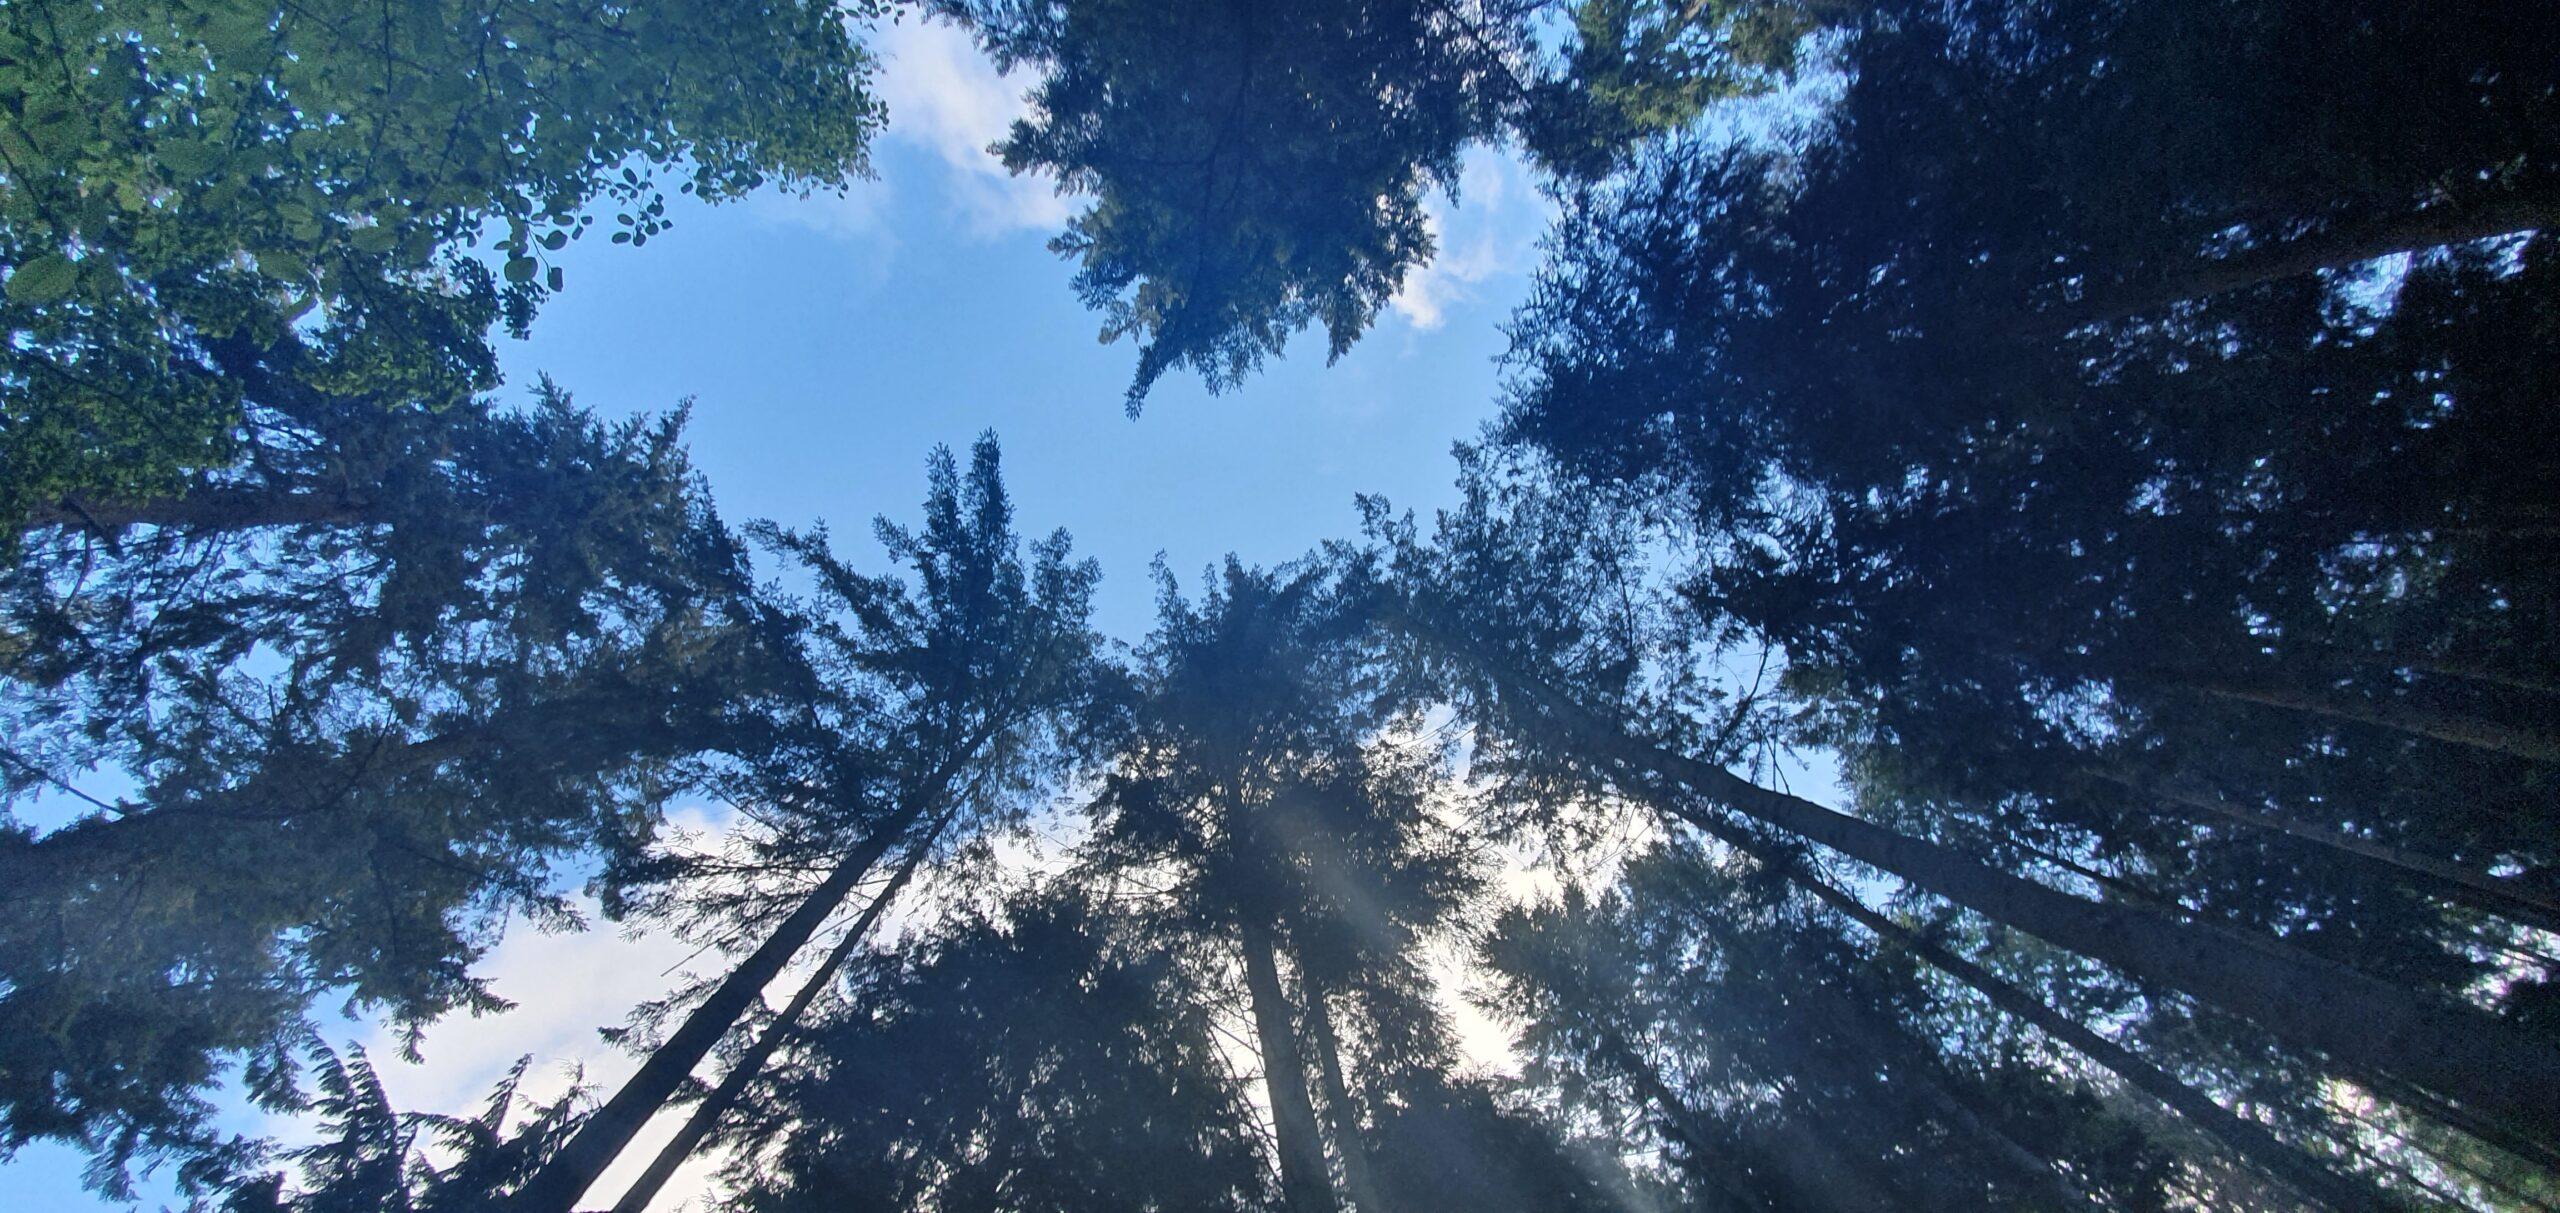 Dunster Tall Tree's Trail